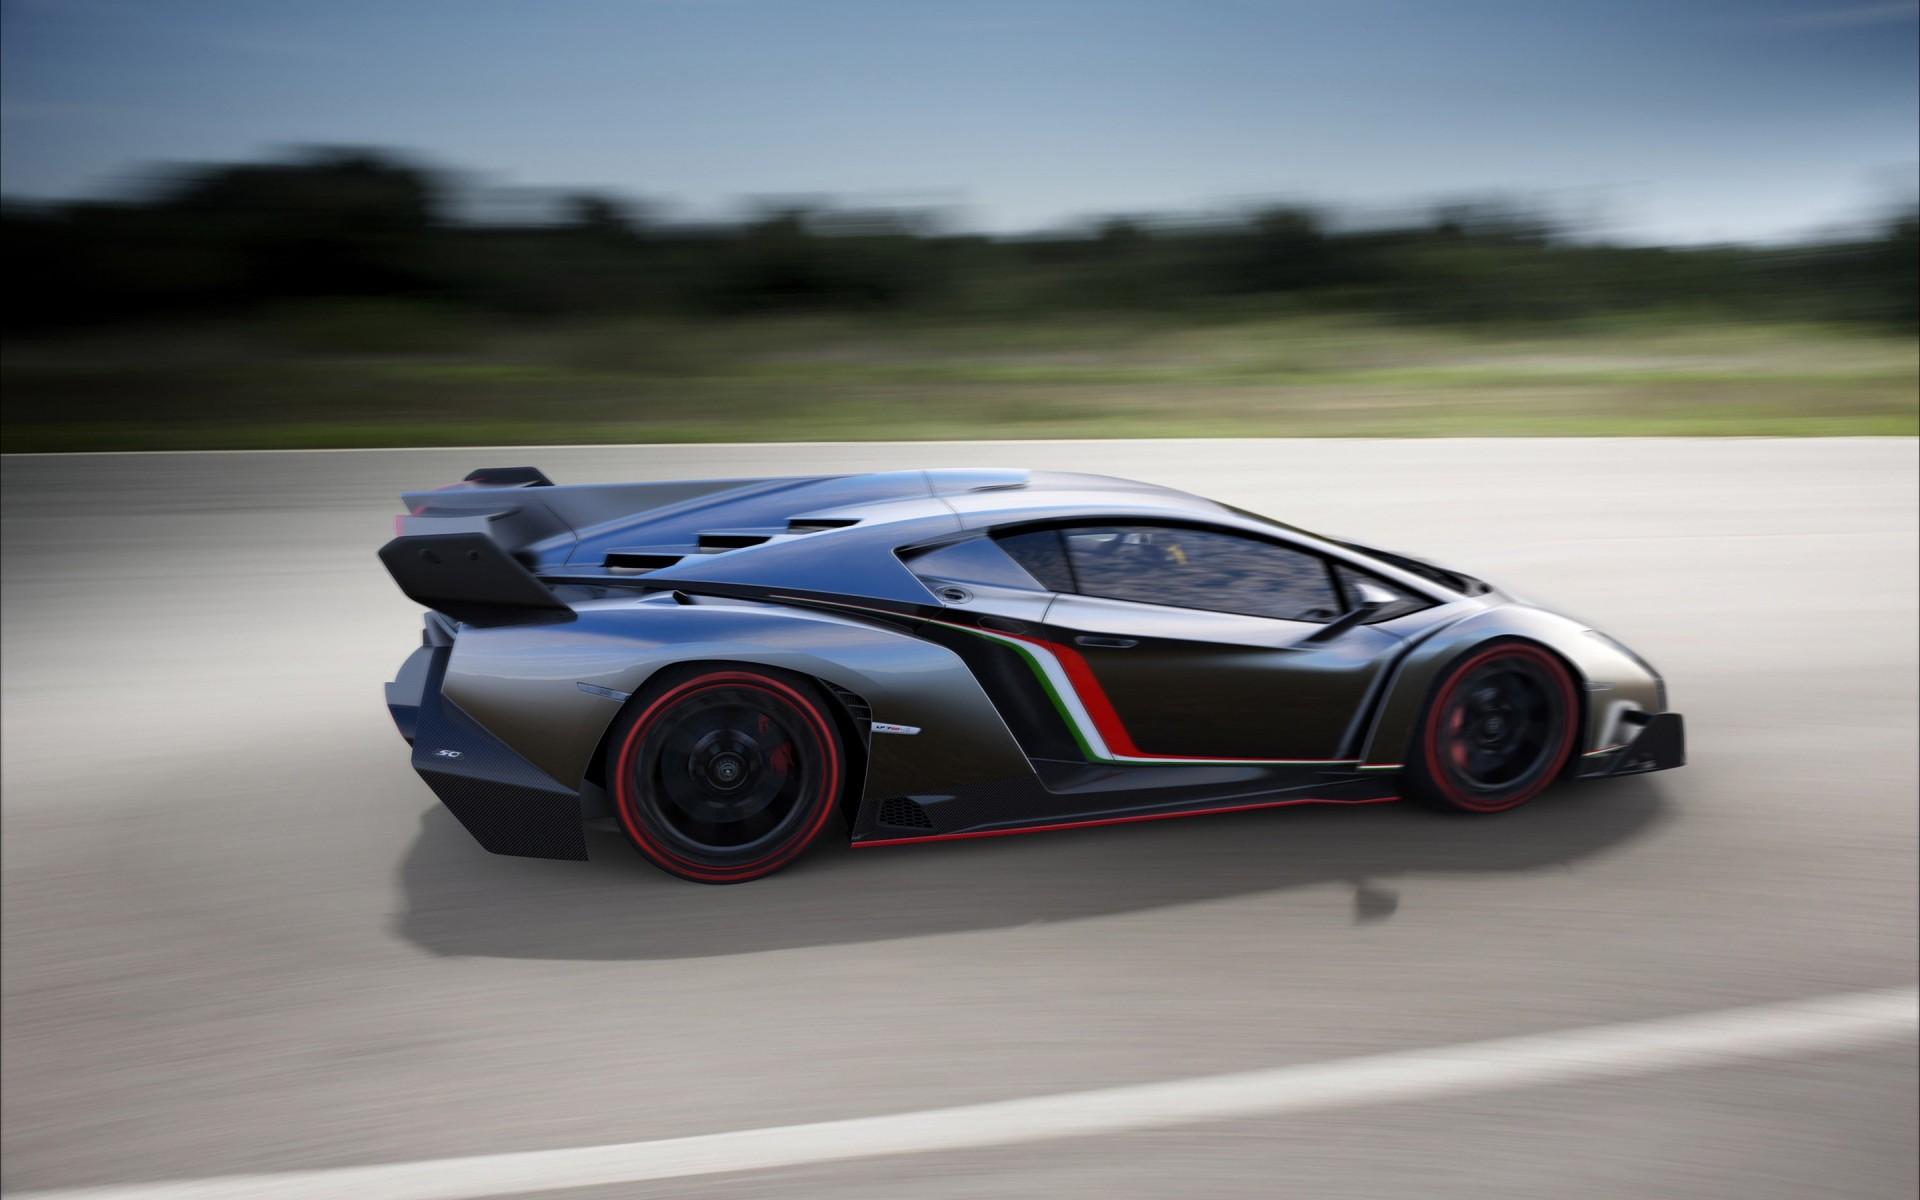 Lamborghini Veneno Speed Desktop Wallpapers For Free